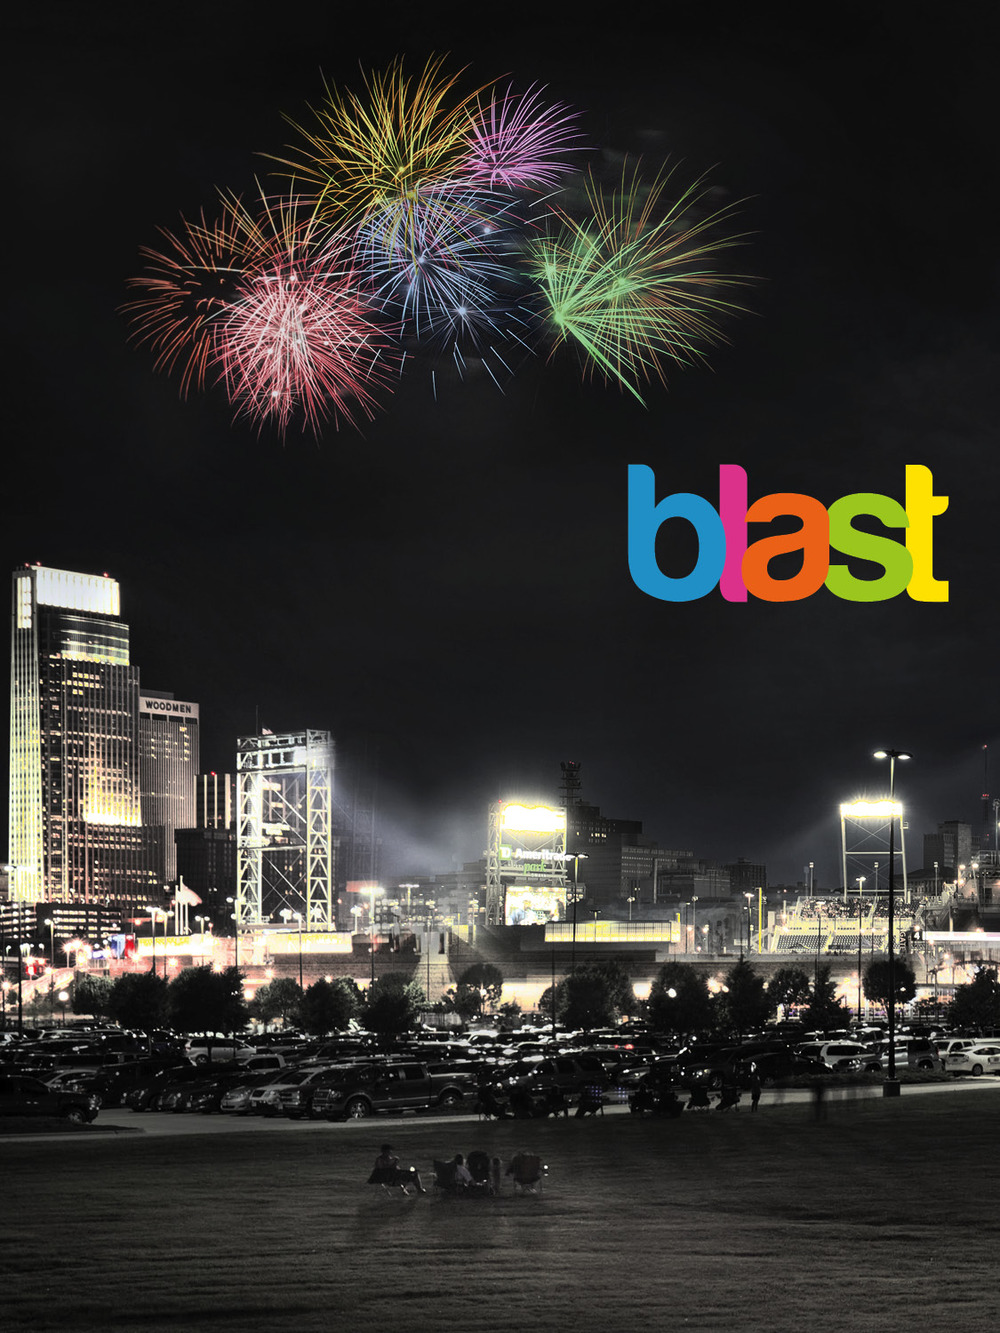 blast4.jpg